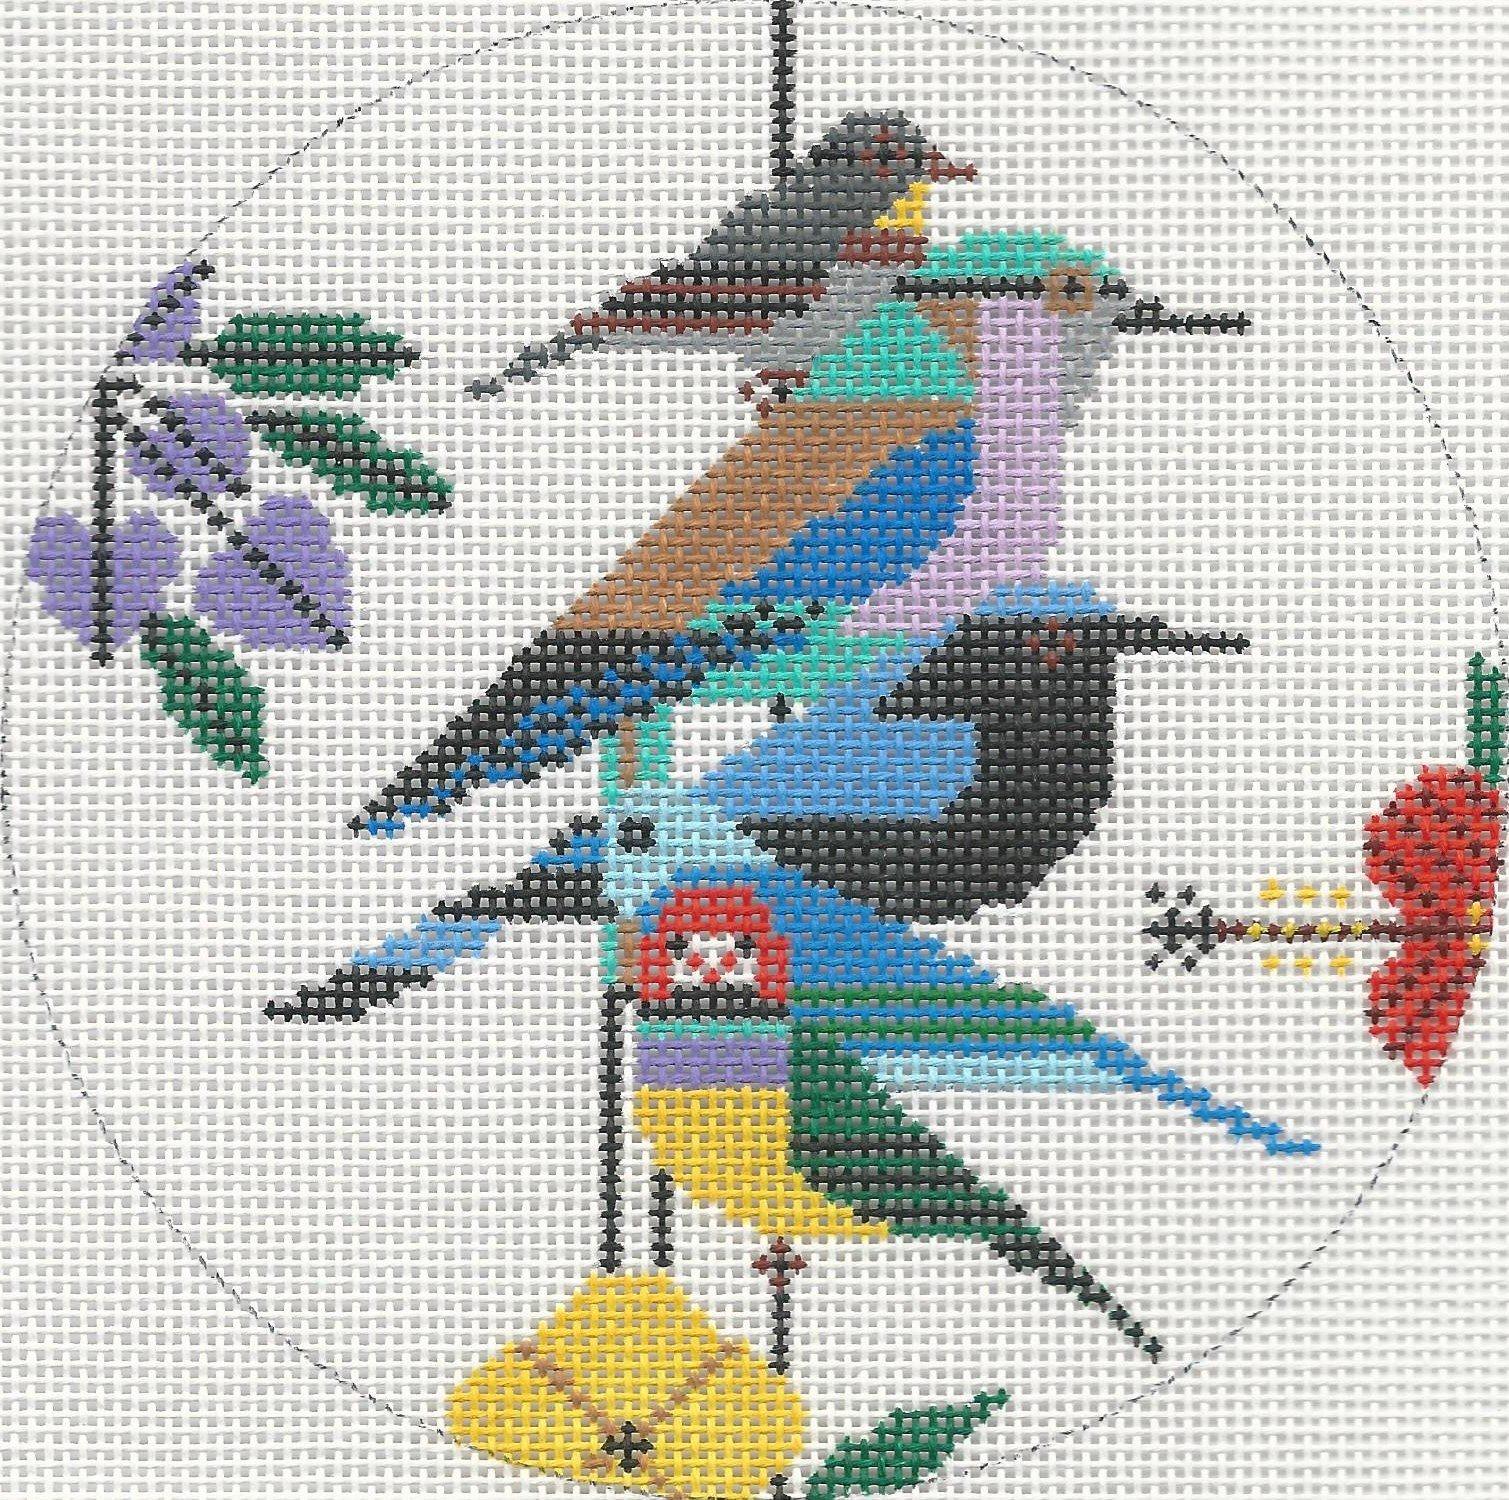 HC0411 - RAIN FOREST BIRDS ORN.